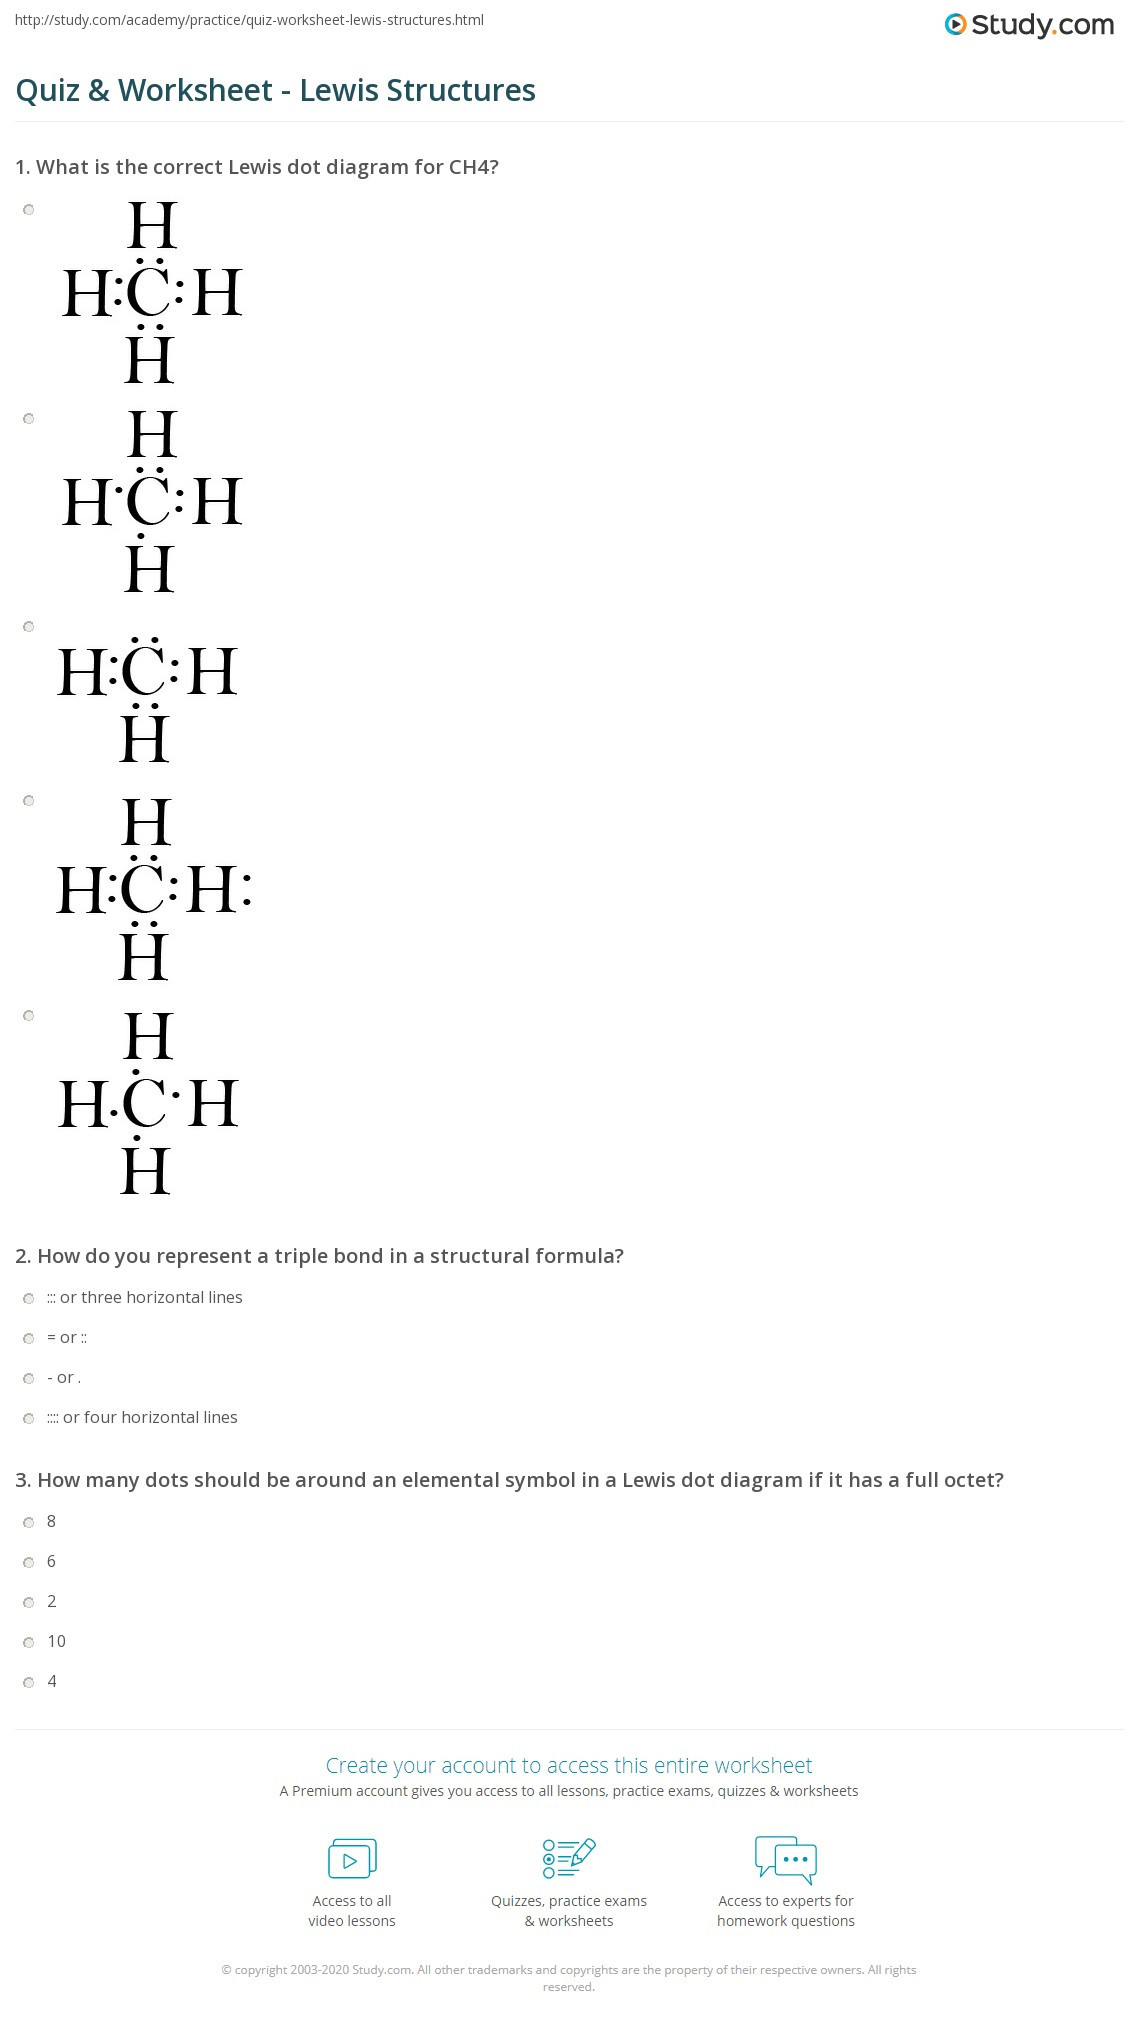 Lewis Dot Diagram Worksheet Quiz & Worksheet Lewis Structures